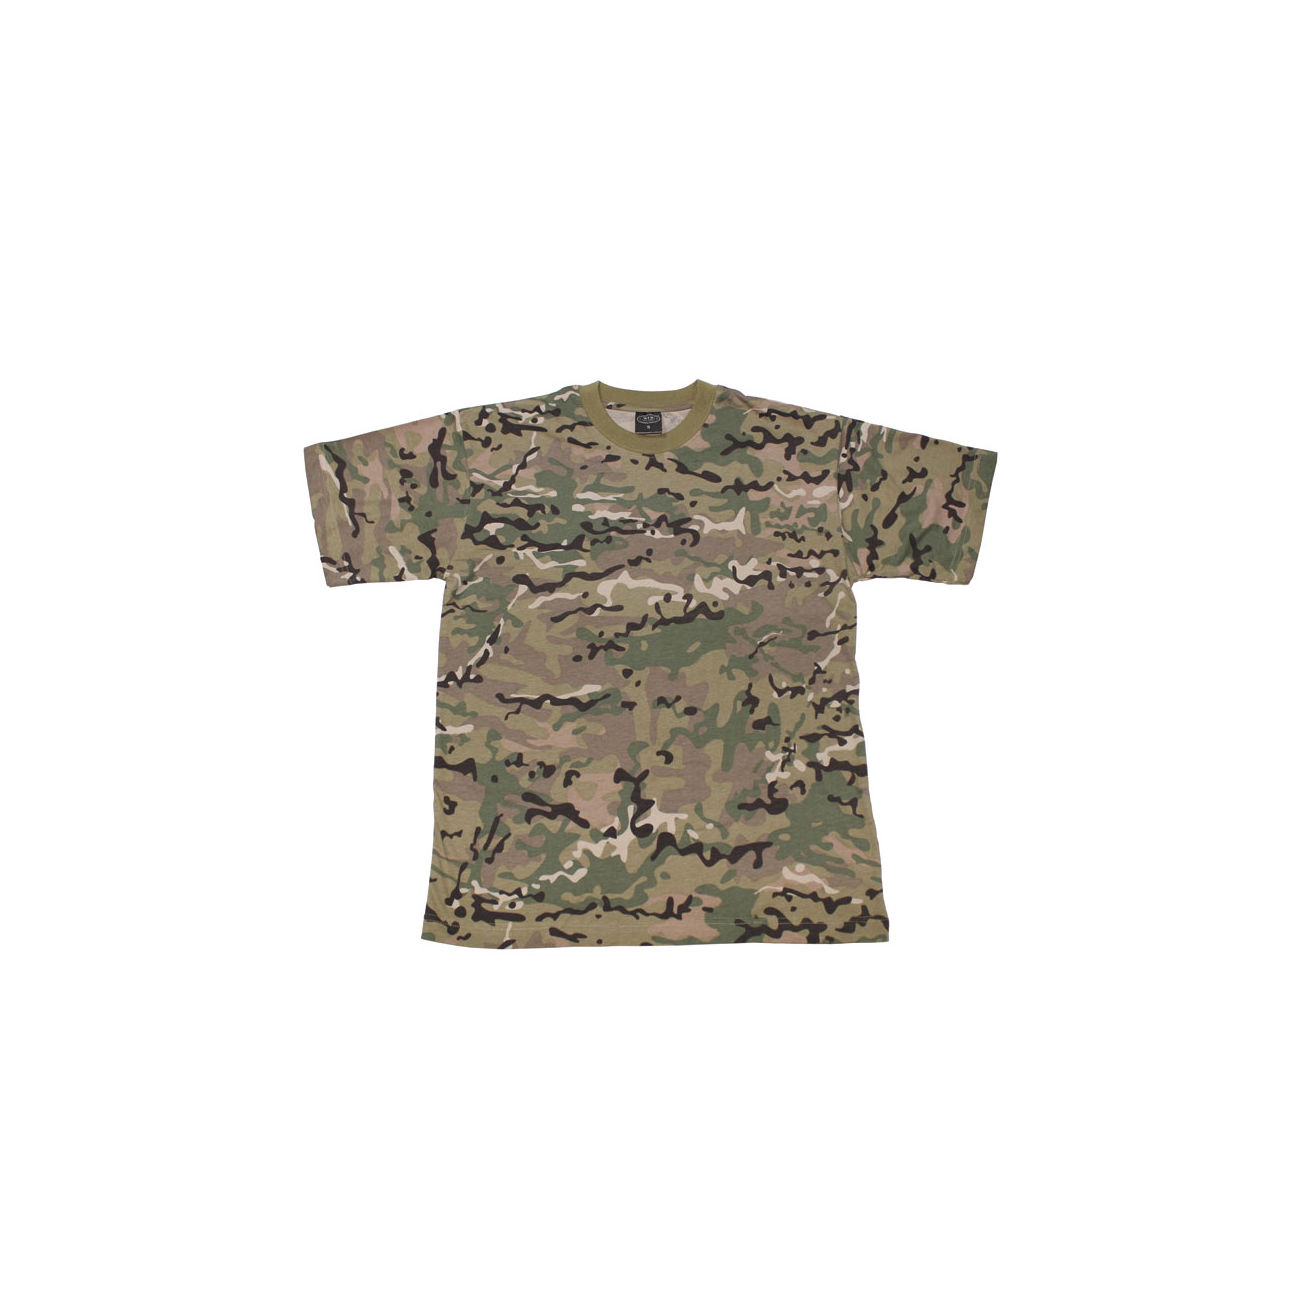 f57bfd11943dc1 MFH T-Shirt operation camo günstig kaufen - Kotte & Zeller